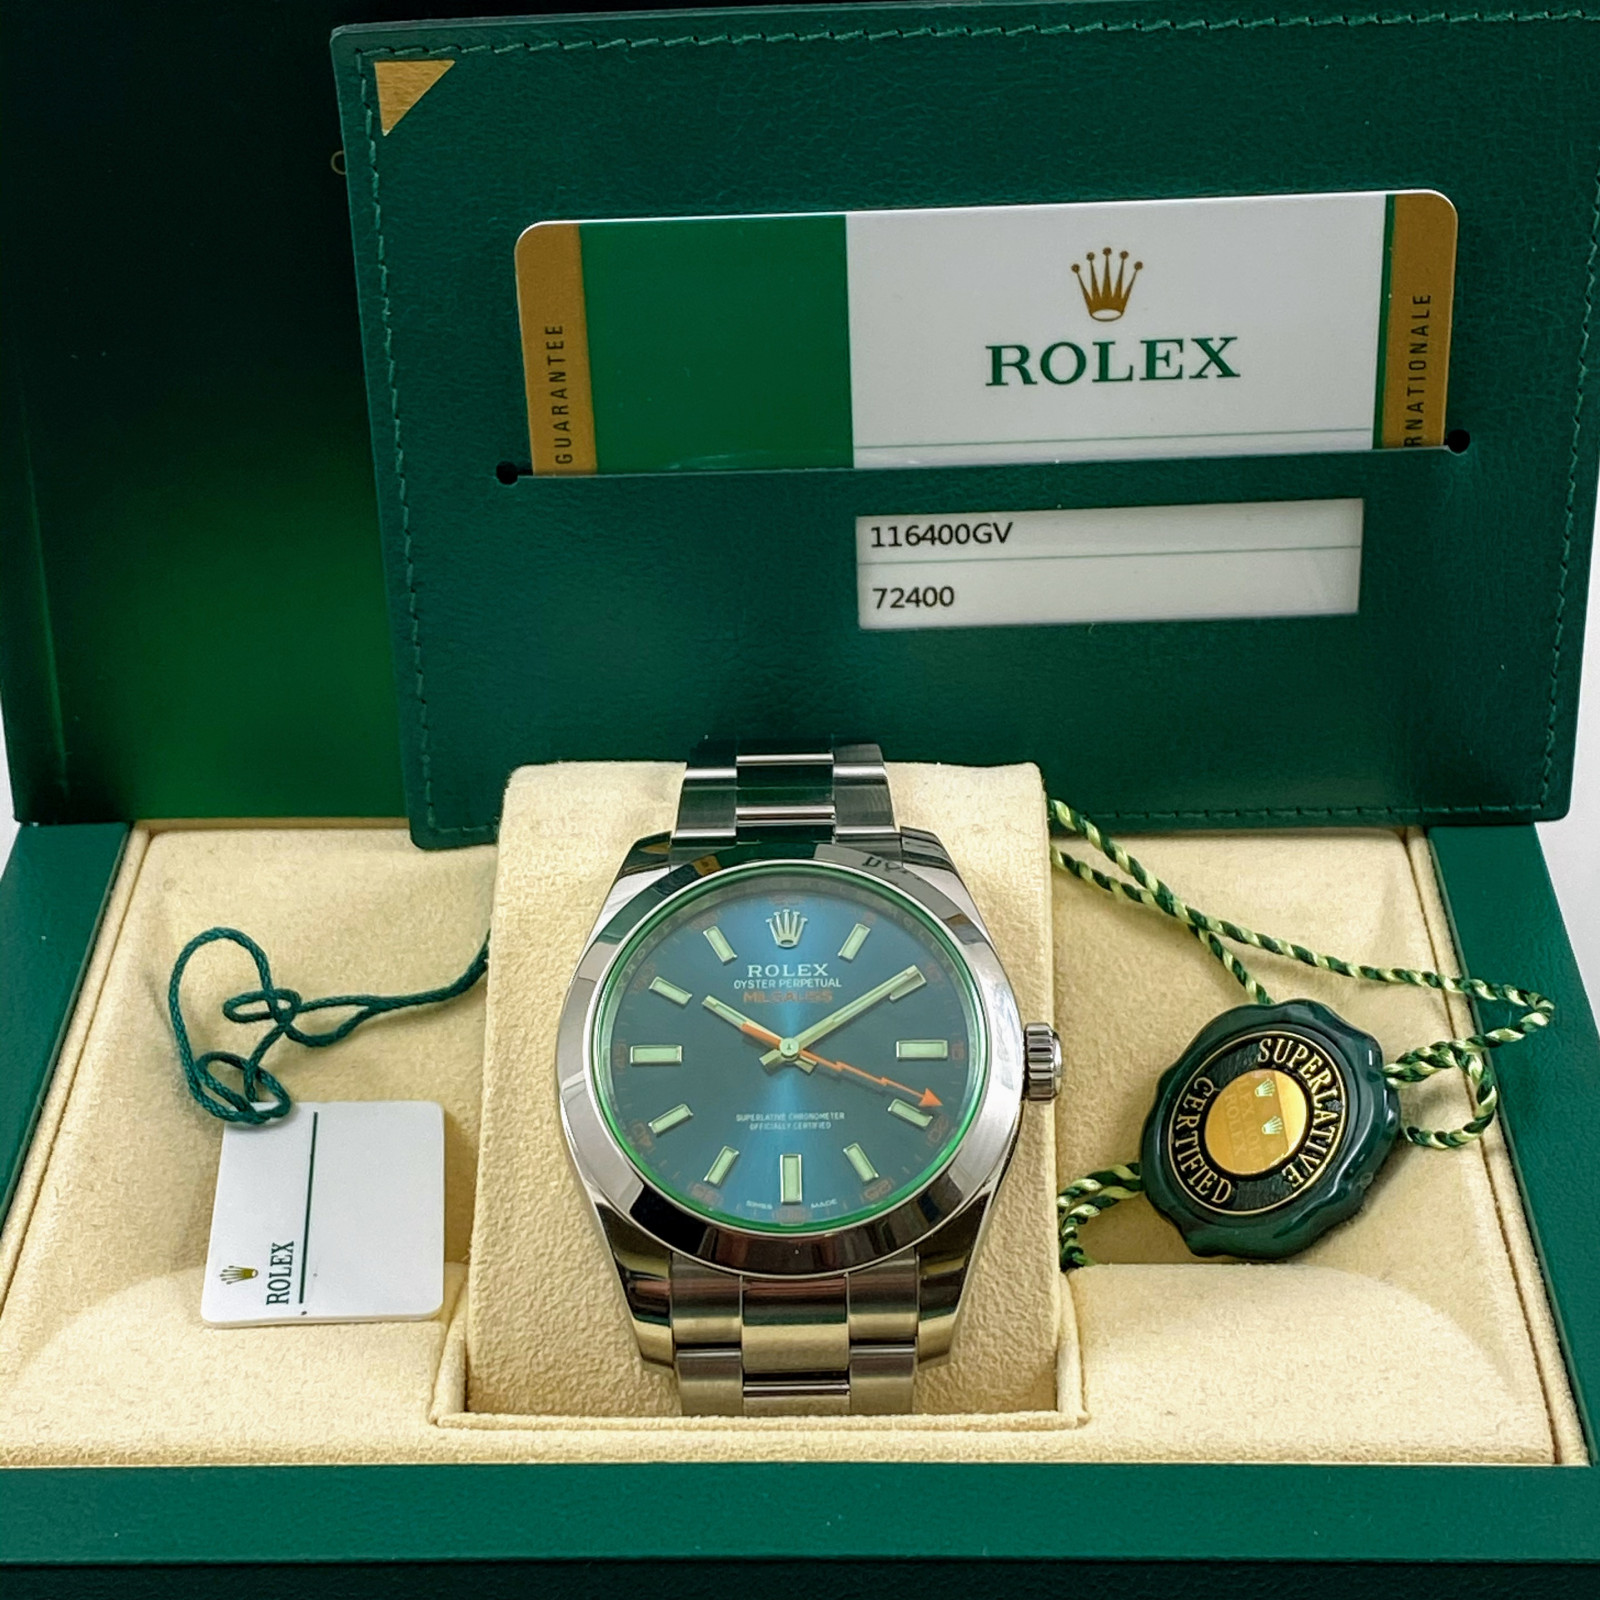 Rolex Milgauss 116400GV 2018 Mint Condition